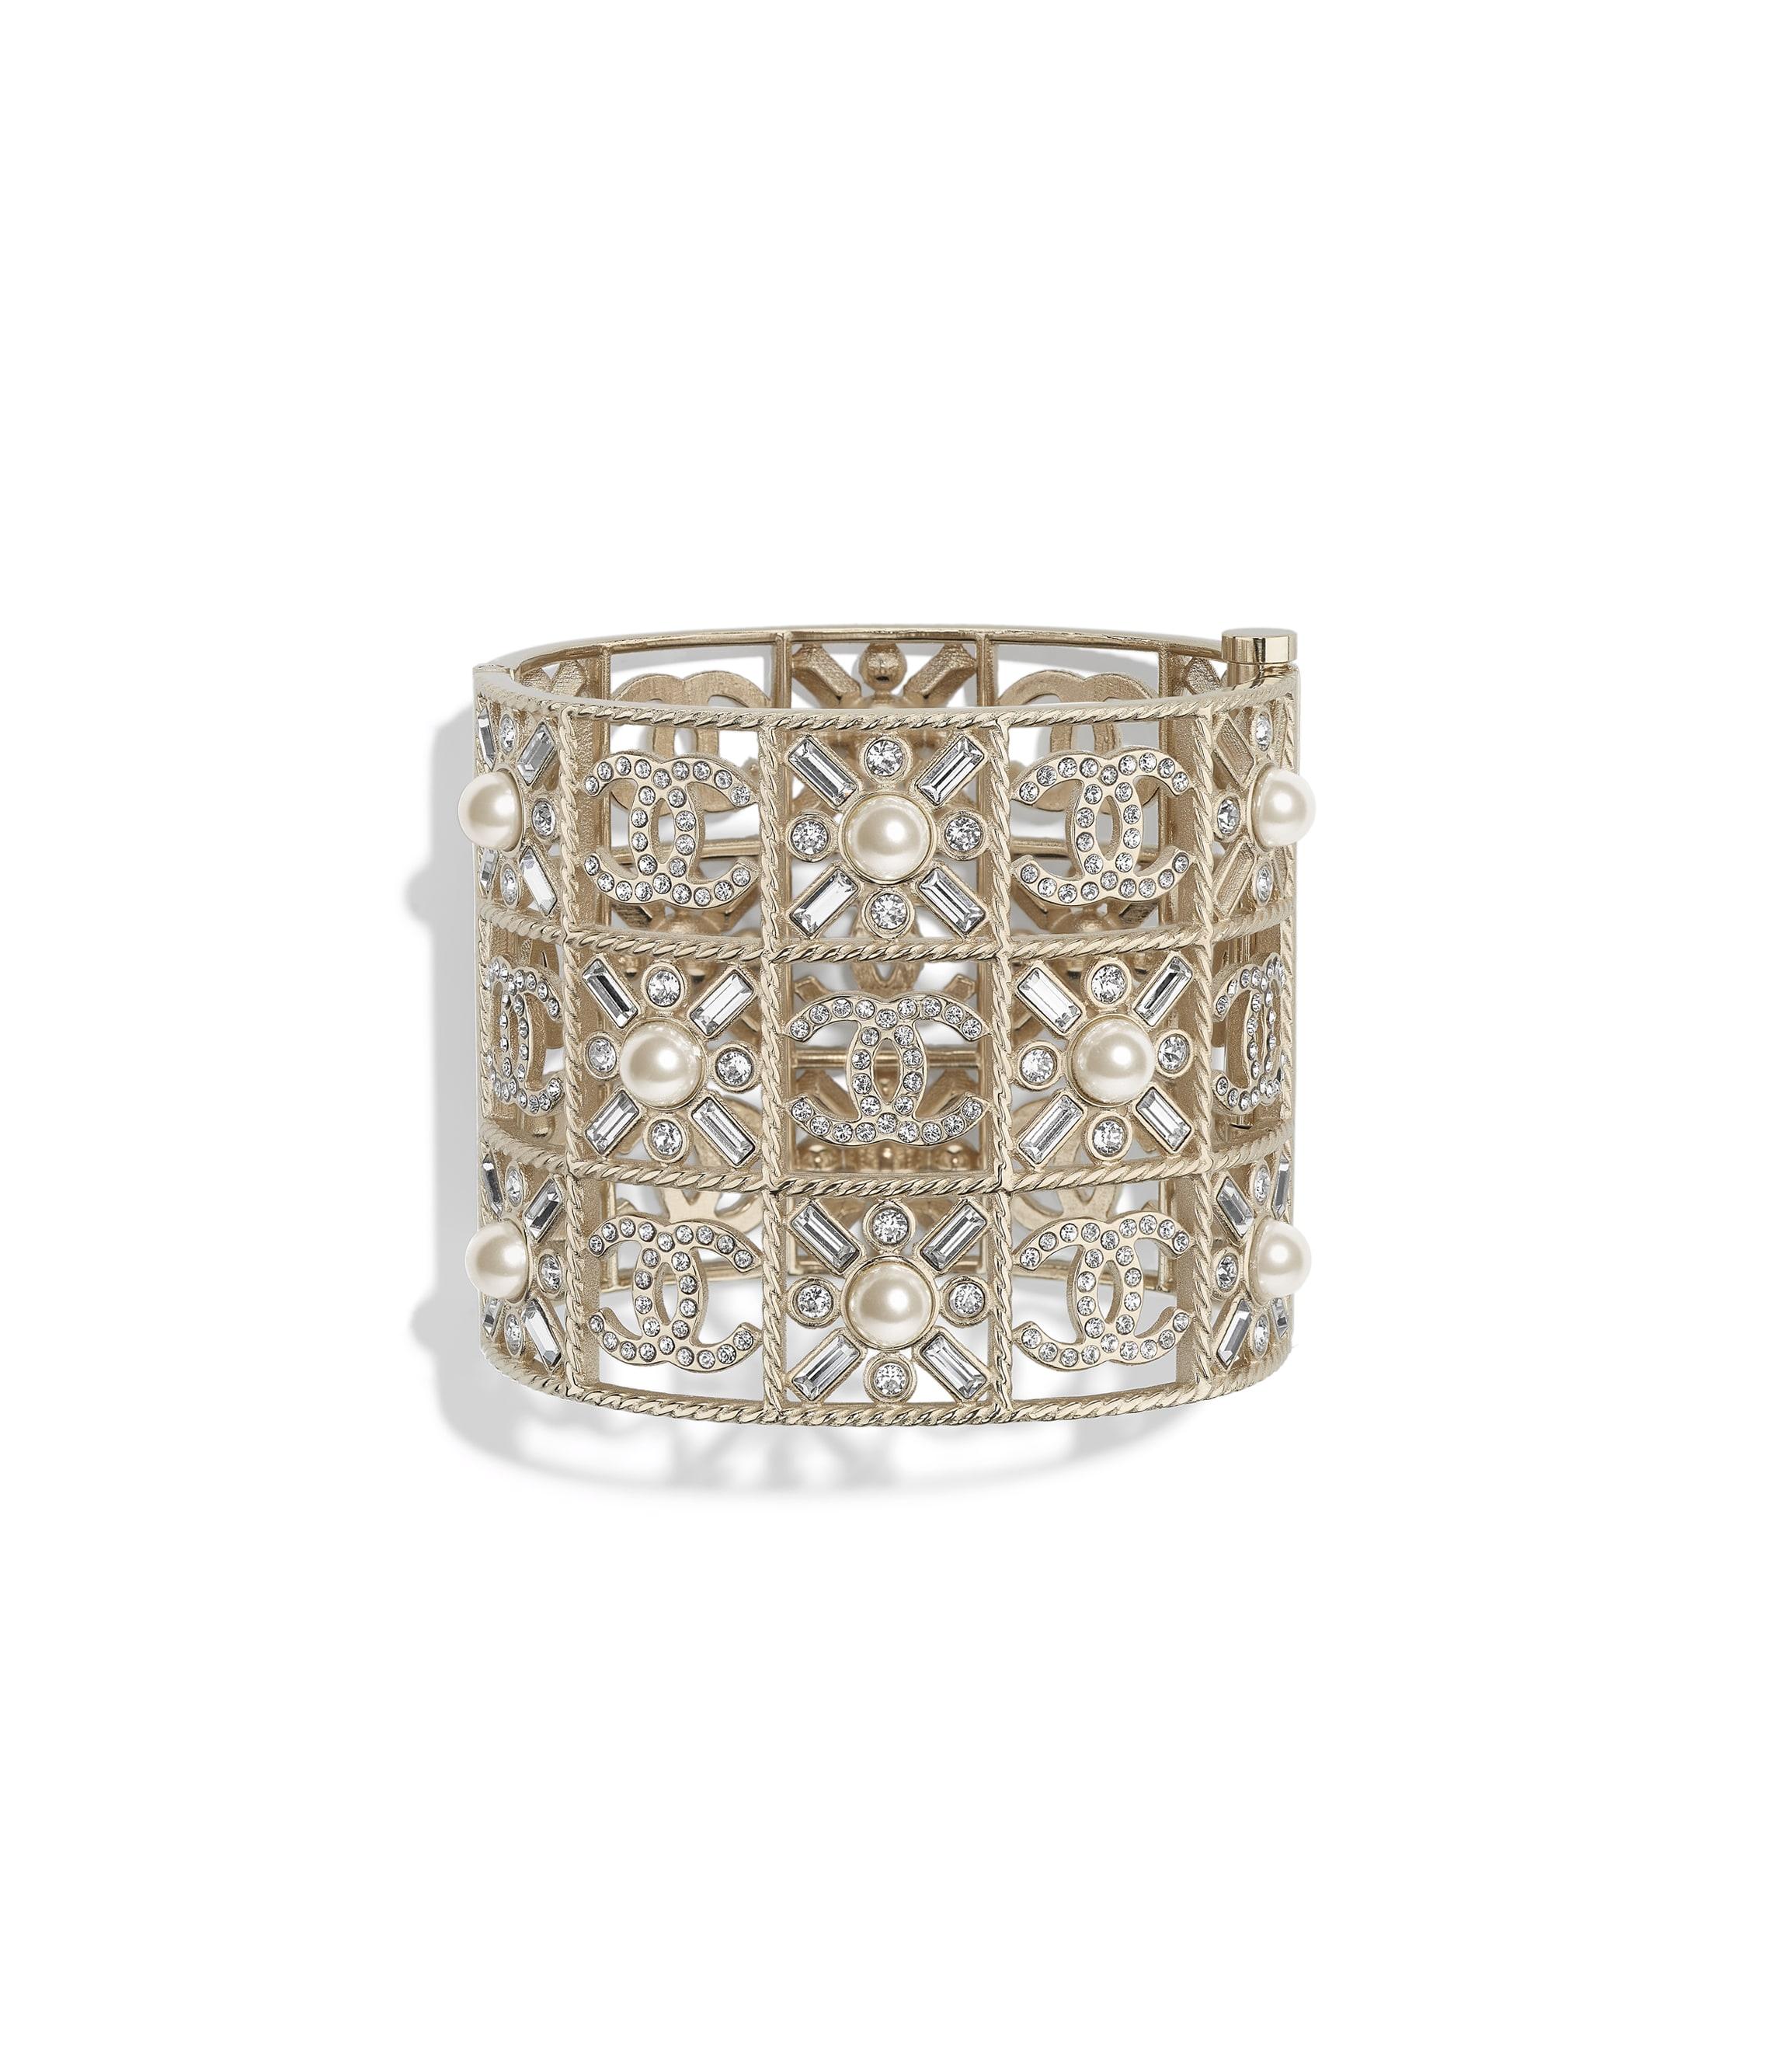 Bracelets   Cuffs - Costume Jewellery - CHANEL 5cc80abc1b63